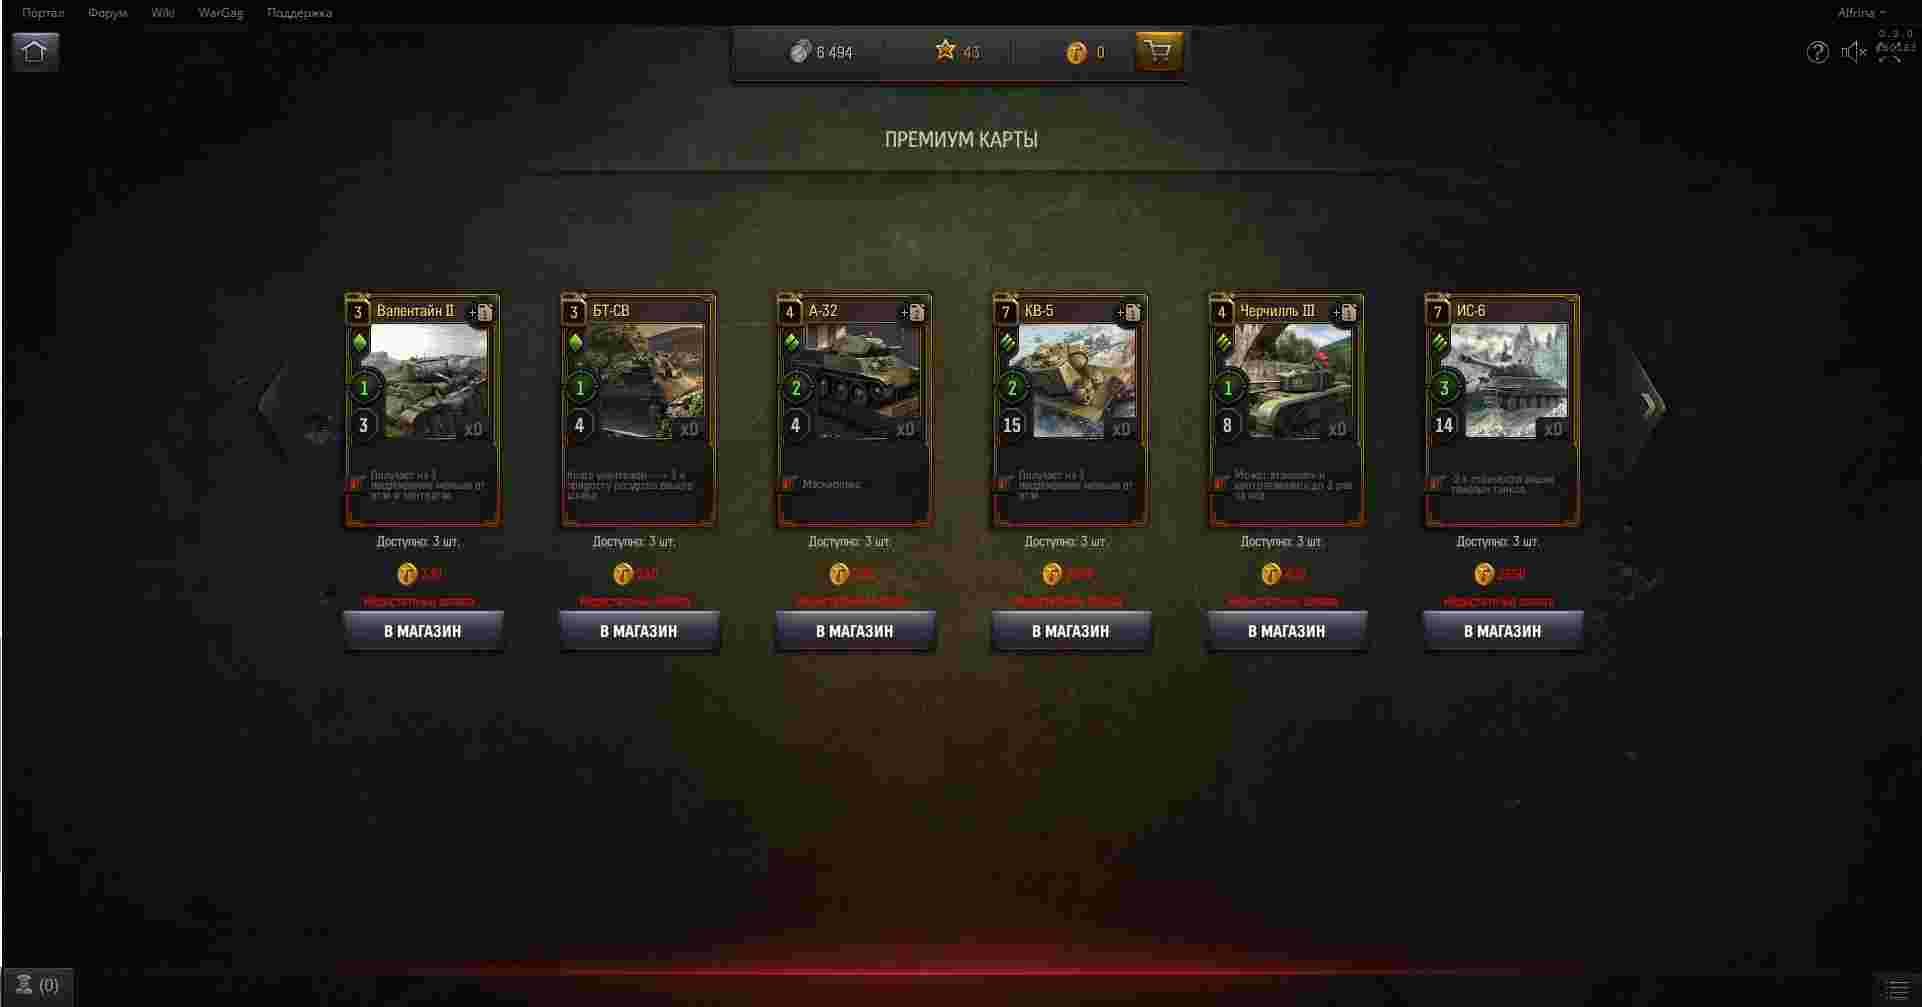 WoT_Generals_Screens_UI_Cards_Image_01